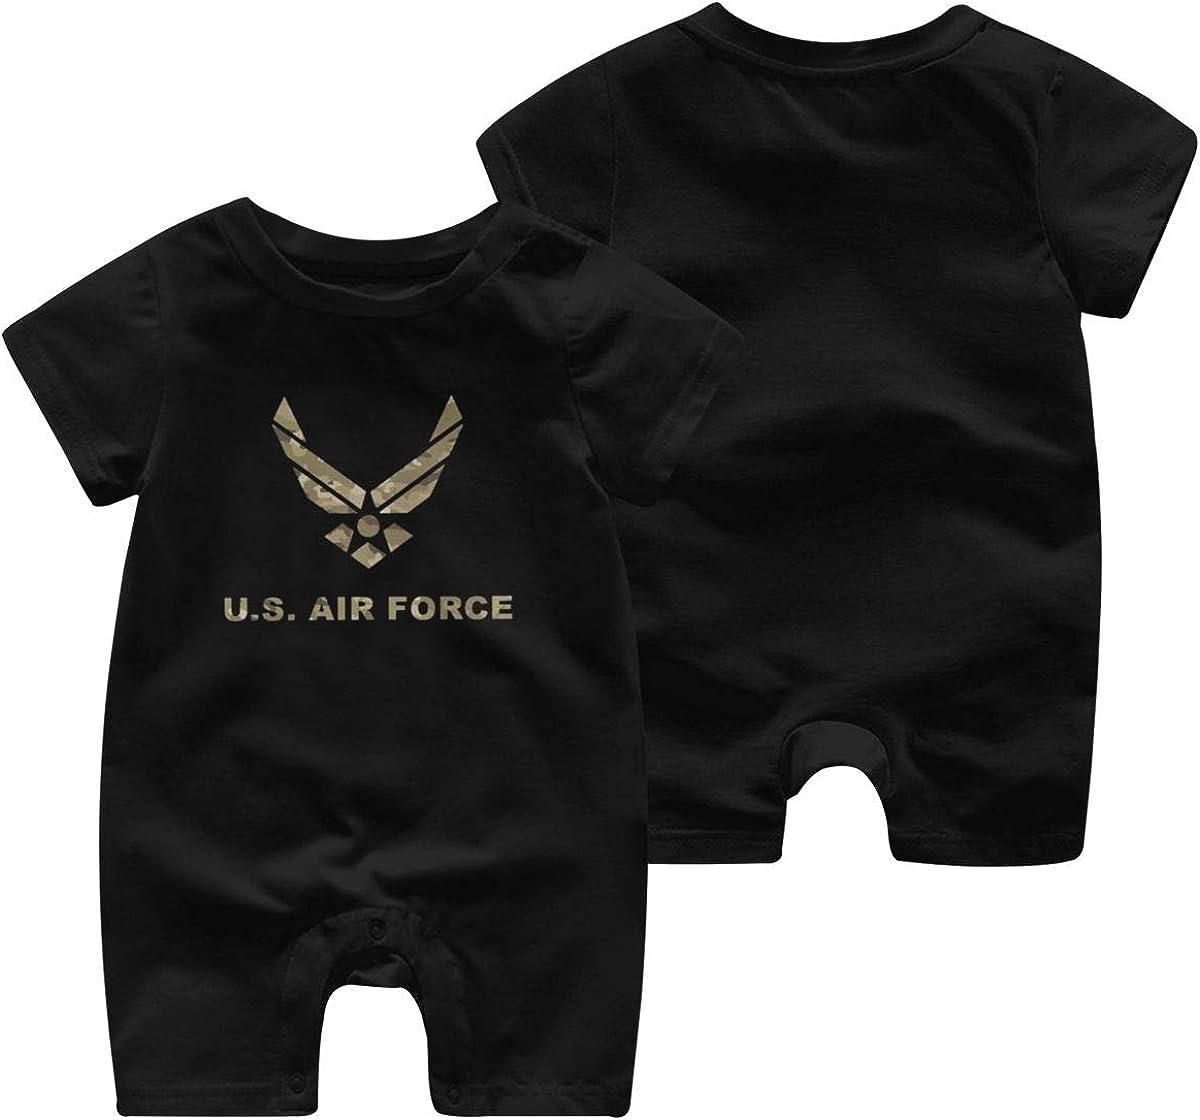 5husihai Us Air Force USAF 1-24 Months Boy Girl Baby Short Sleeve Creeper Jumpsuit Black